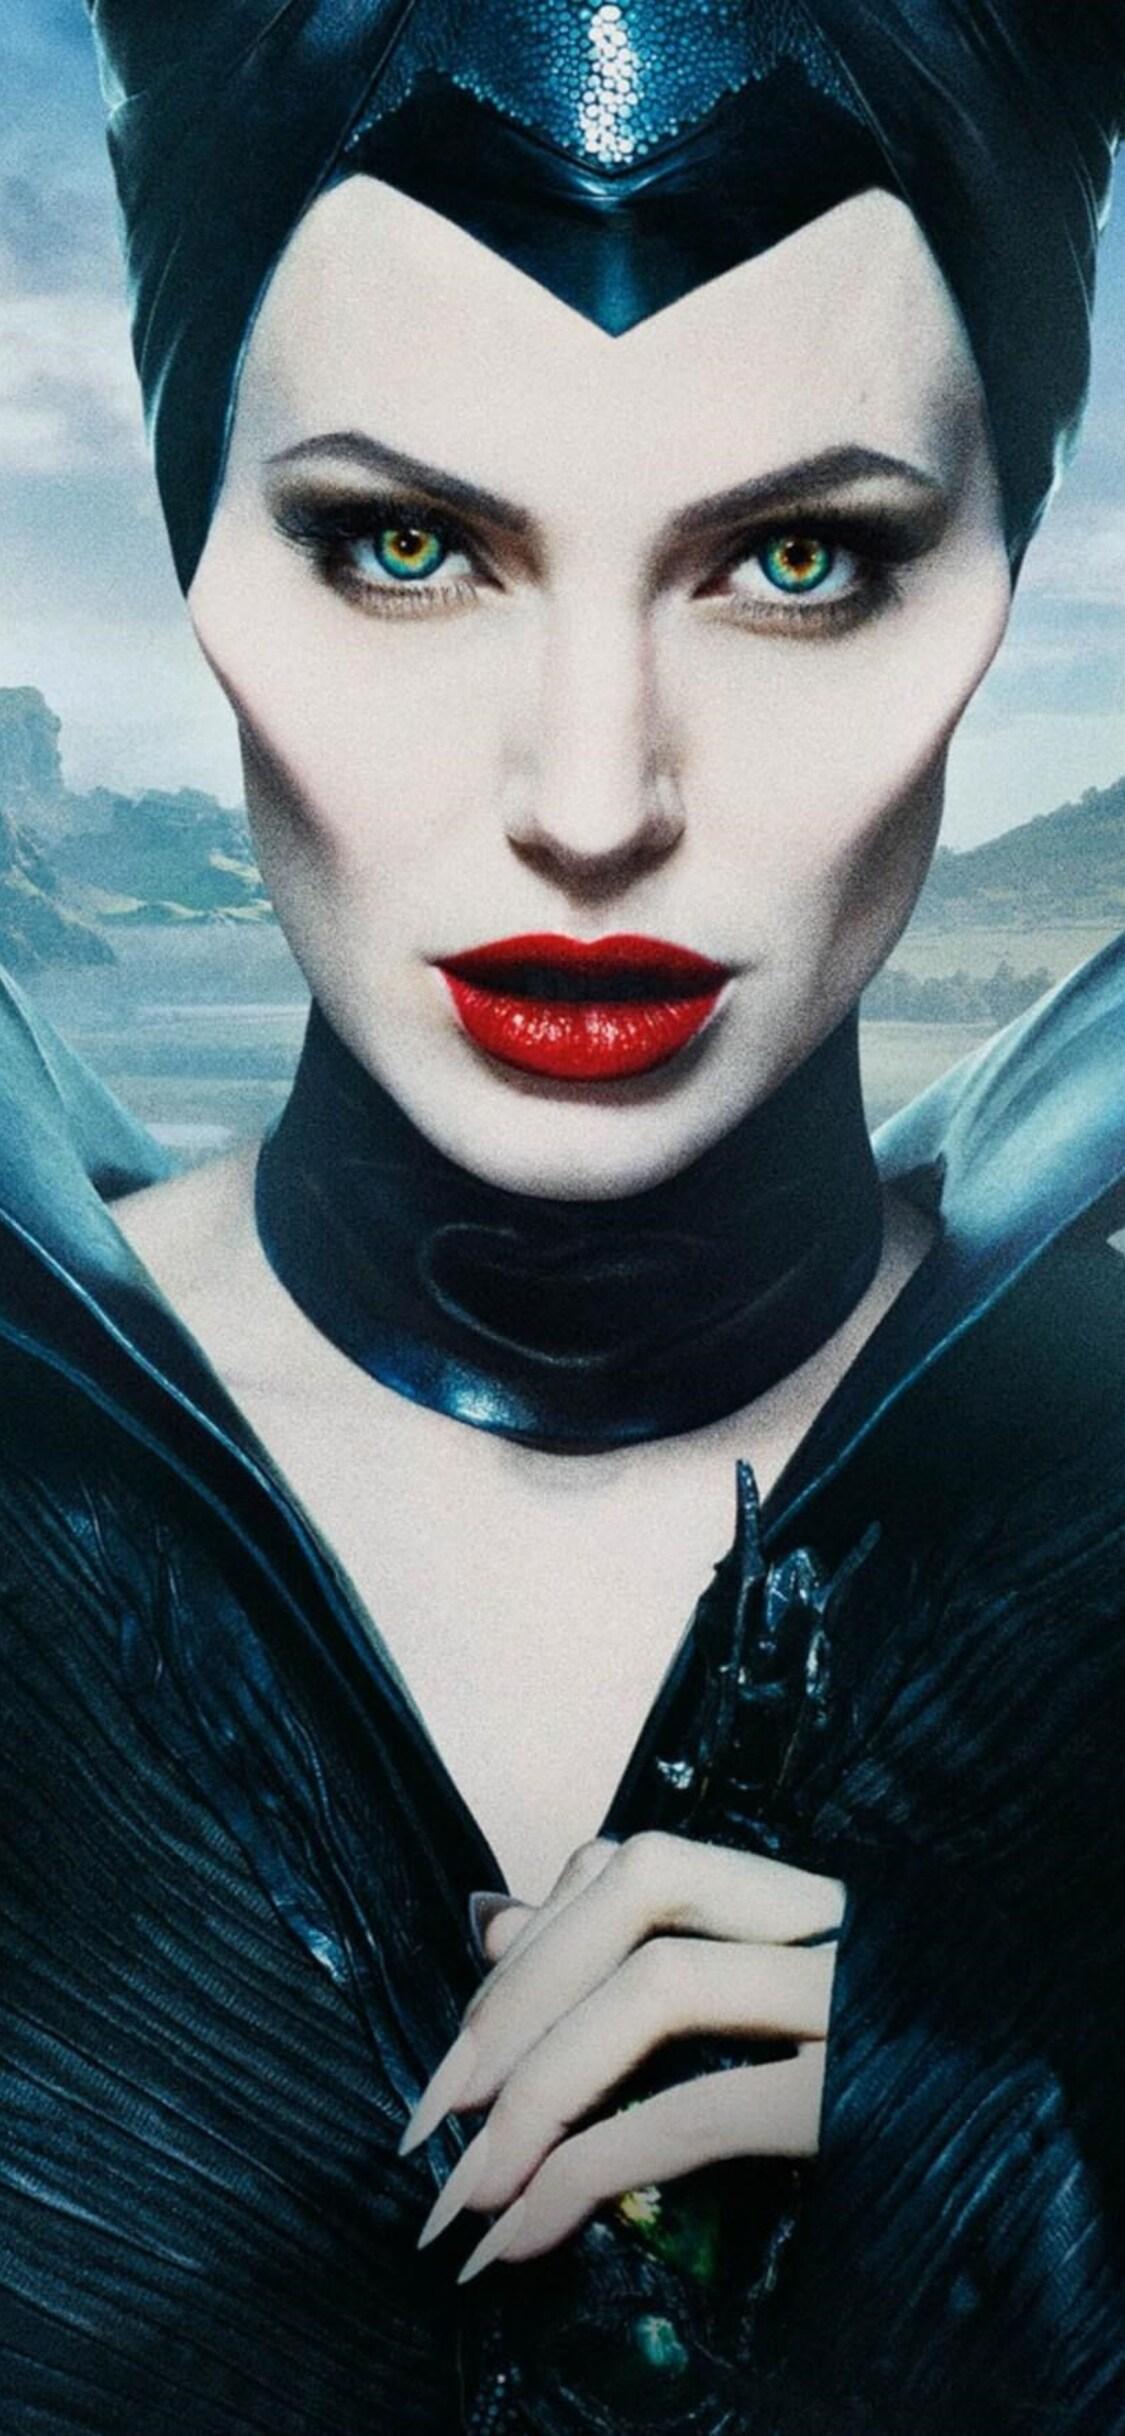 1125x2436 Maleficent Movie Hd Iphone Xs Iphone 10 Iphone X